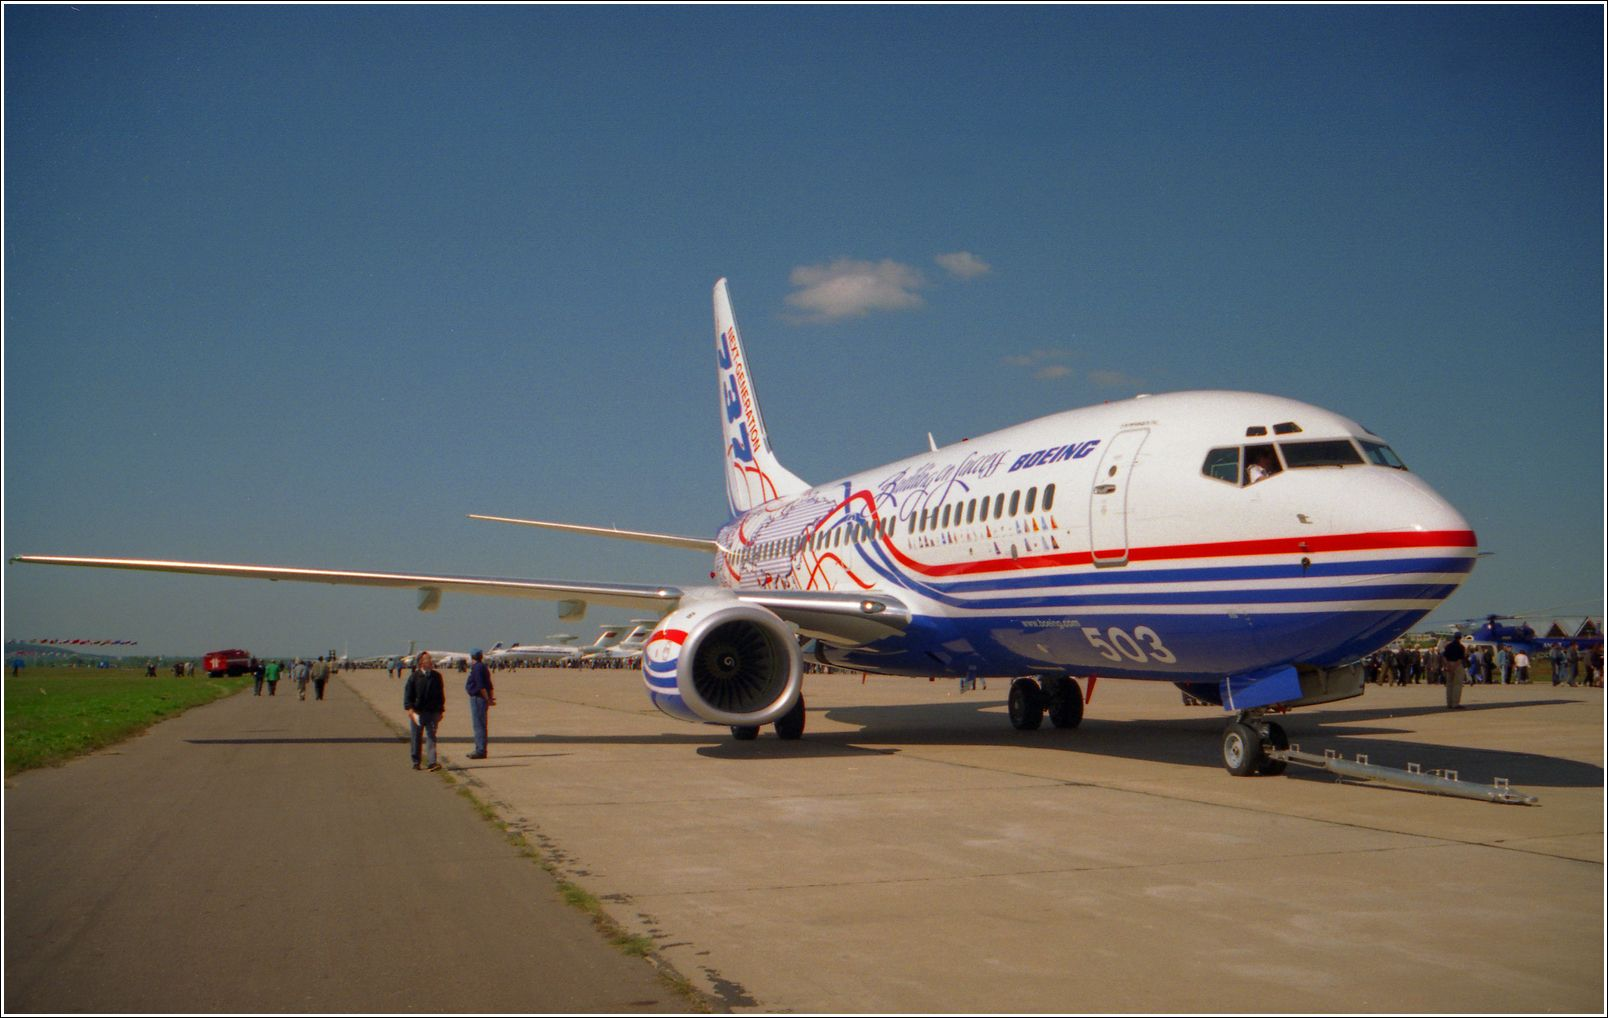 Боинг-737 (1998 год) Боинг-737 авиация самолет стоянка Жуковский 1998